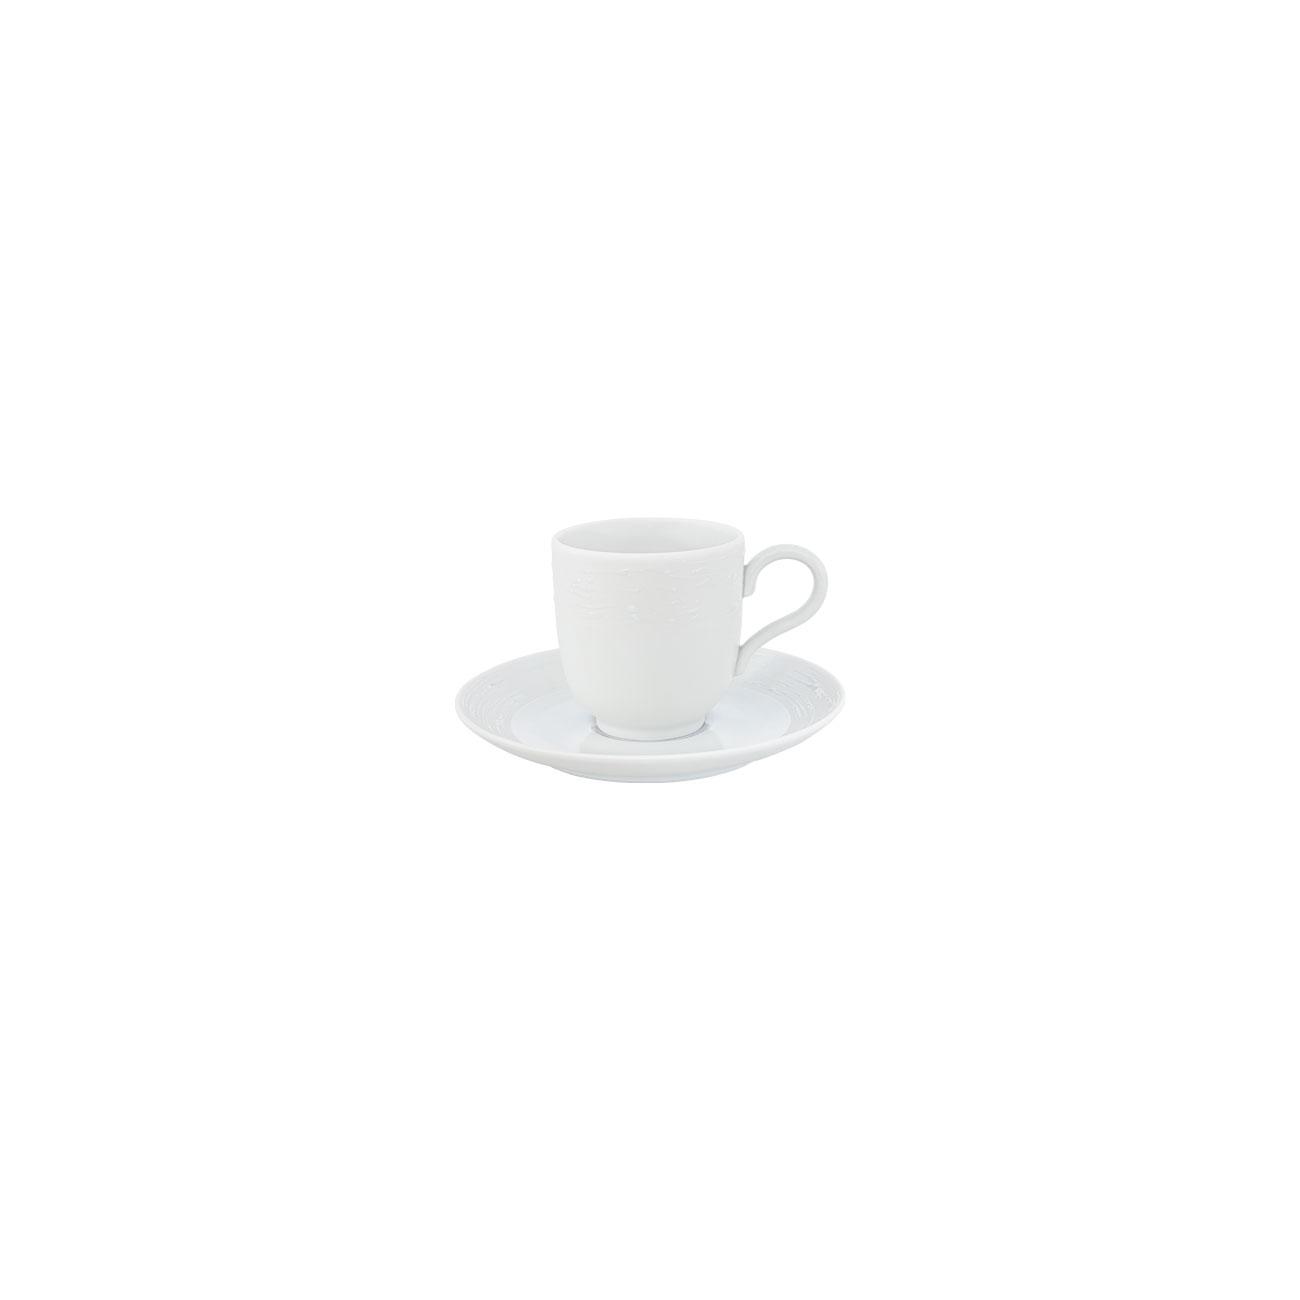 Chávena Café 11cl Antar + Pires Café 12cm Olympus